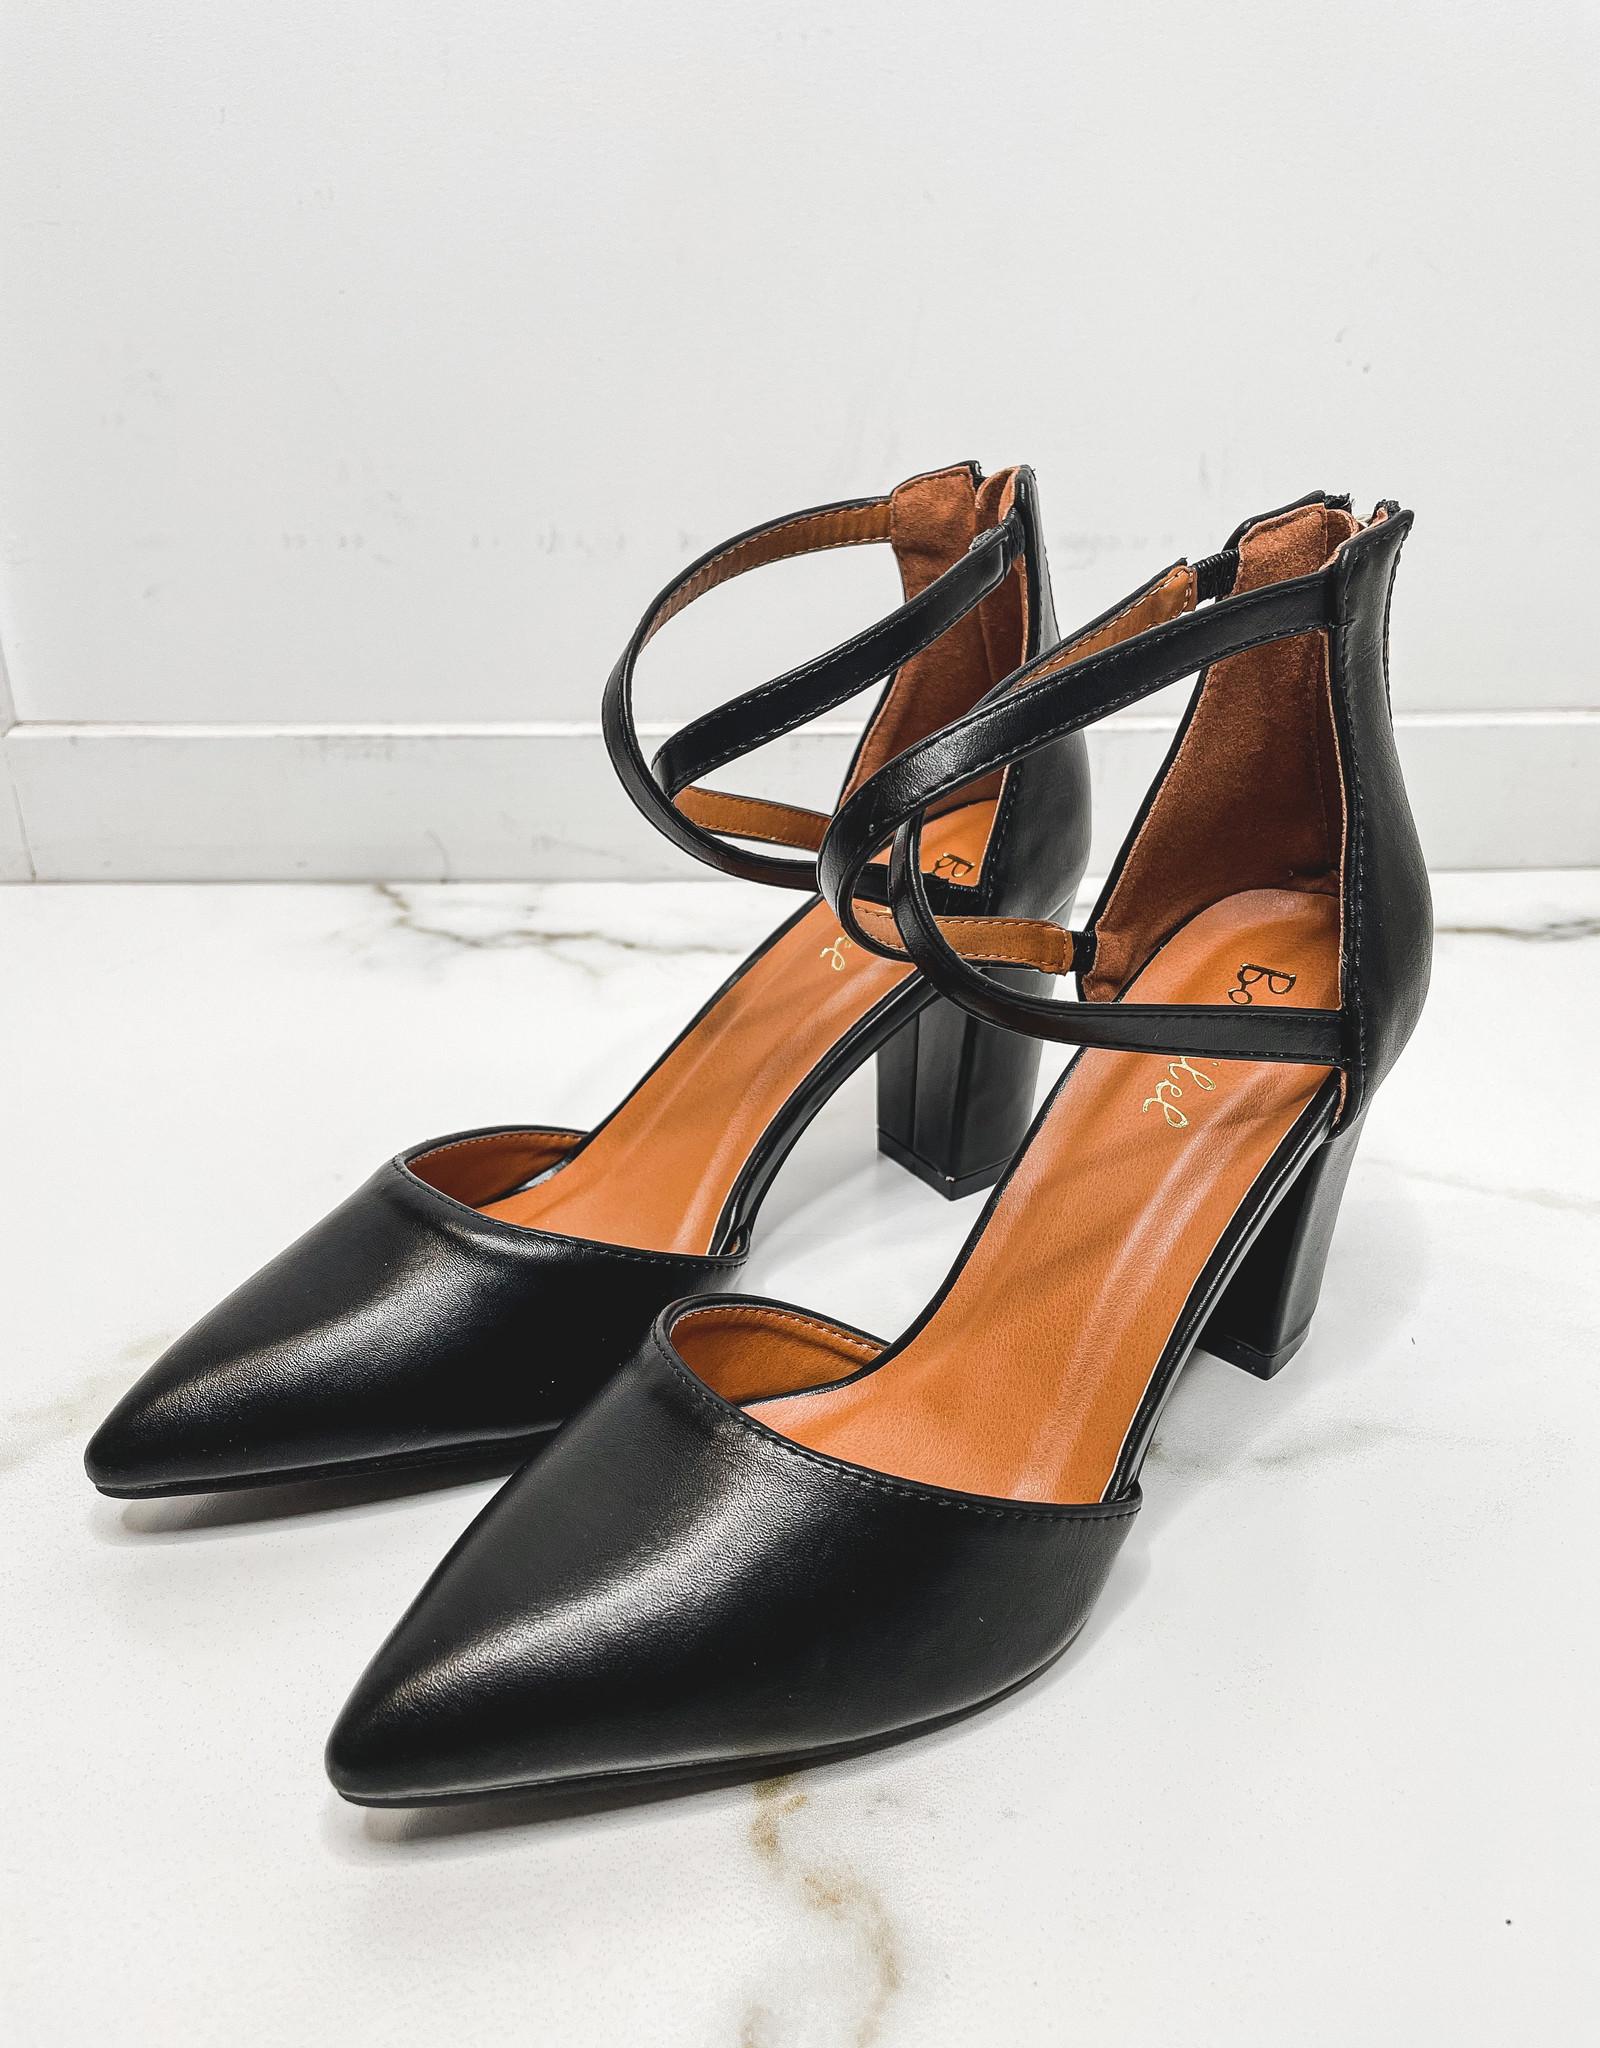 HUSH Block heel, closed toe pump w/ ankle x